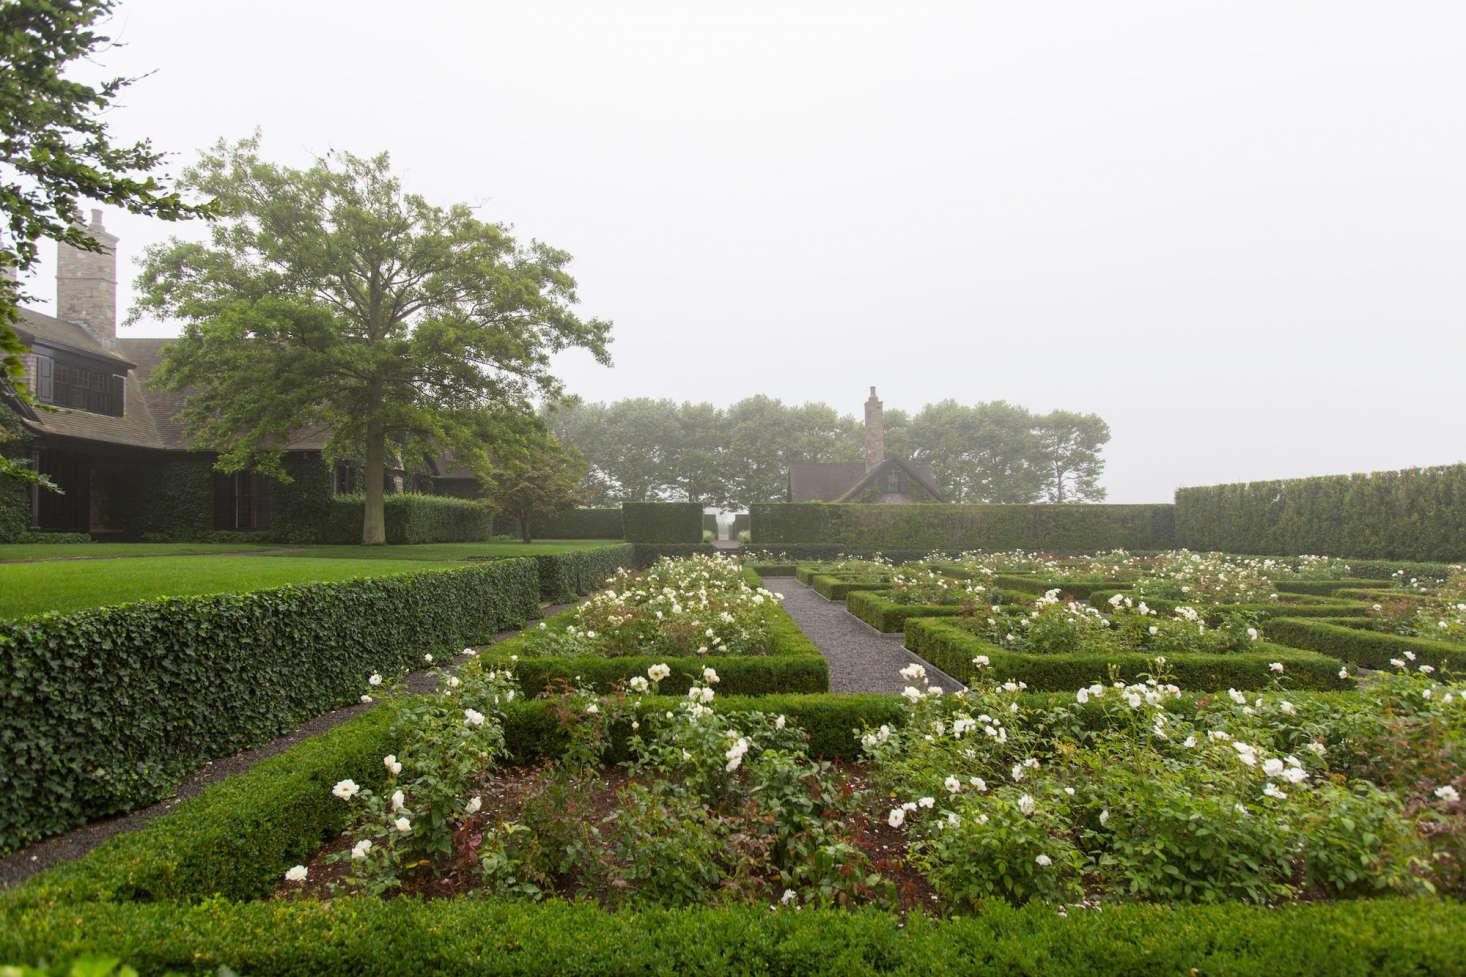 Sunken rose garden boxwood hedges Watermill NY garden Quincy Hammond